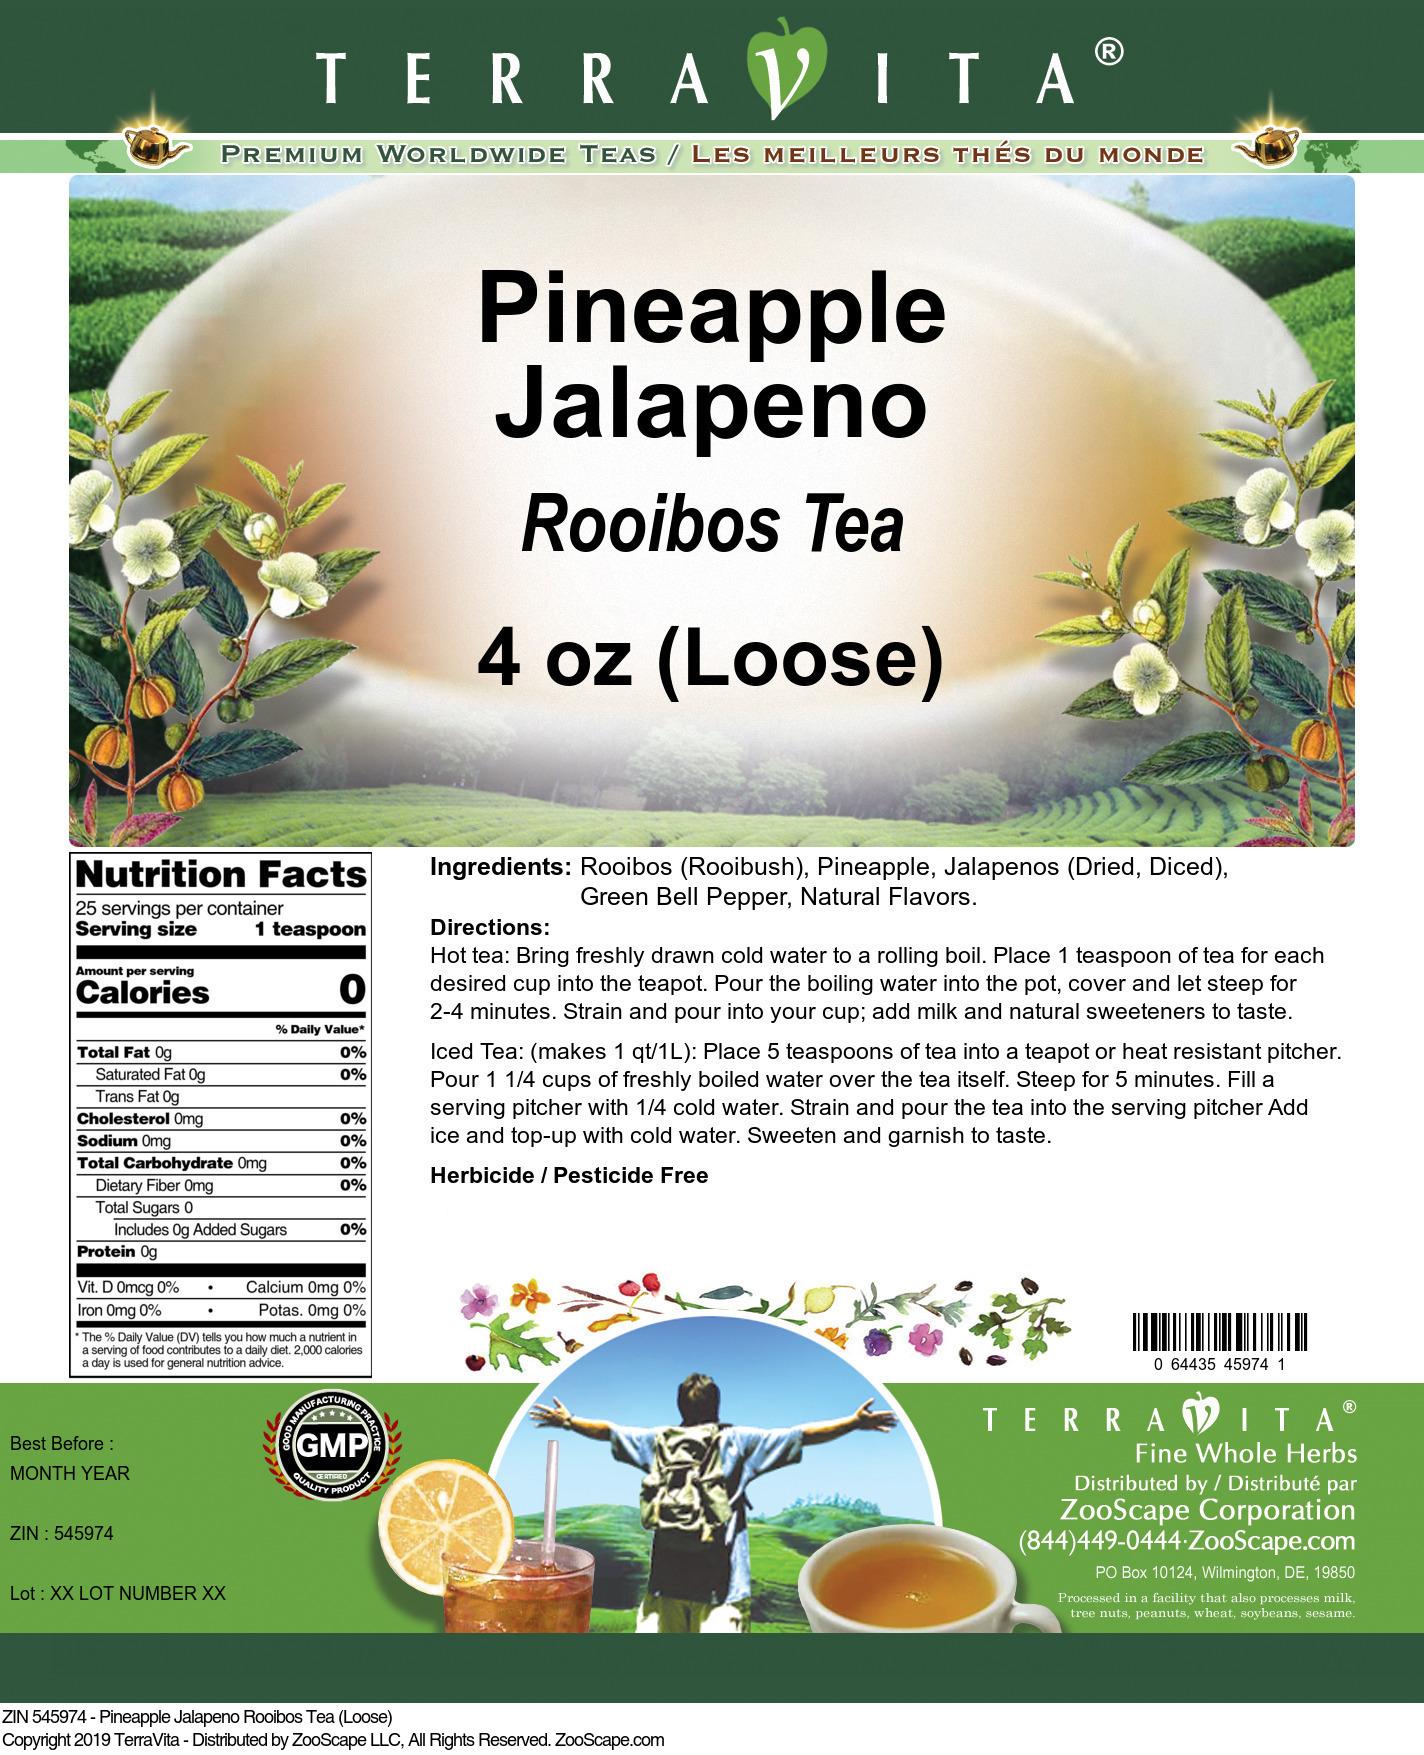 Pineapple Jalapeno Rooibos Tea (Loose)